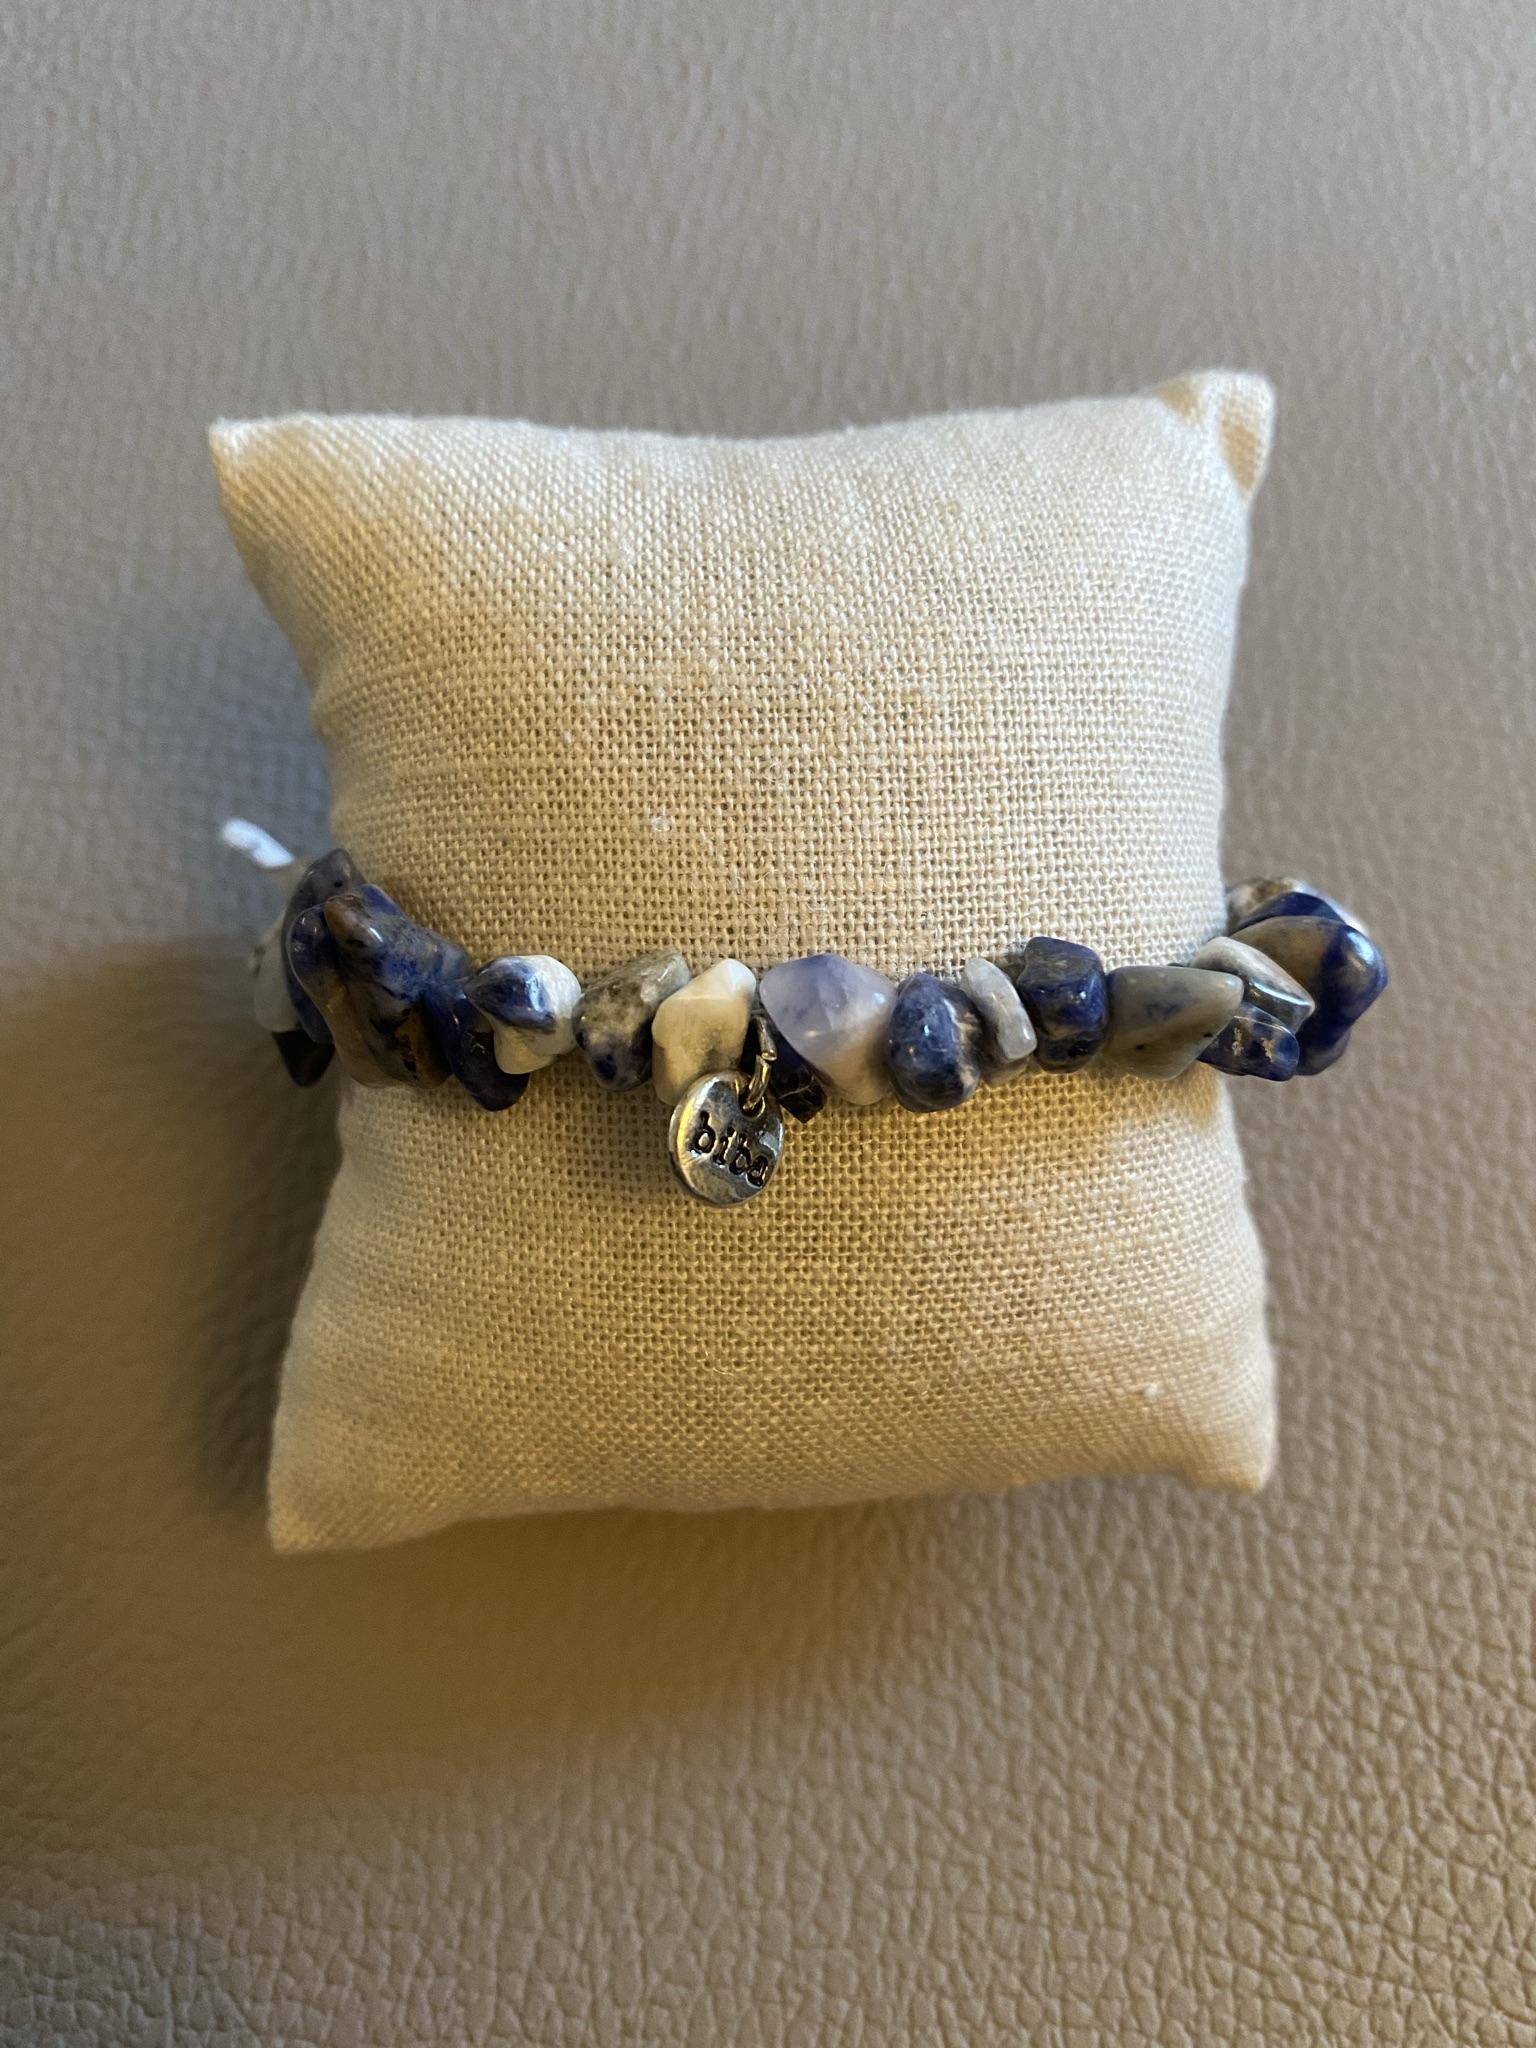 Biba Armband blau weiß grau Halbedelstein